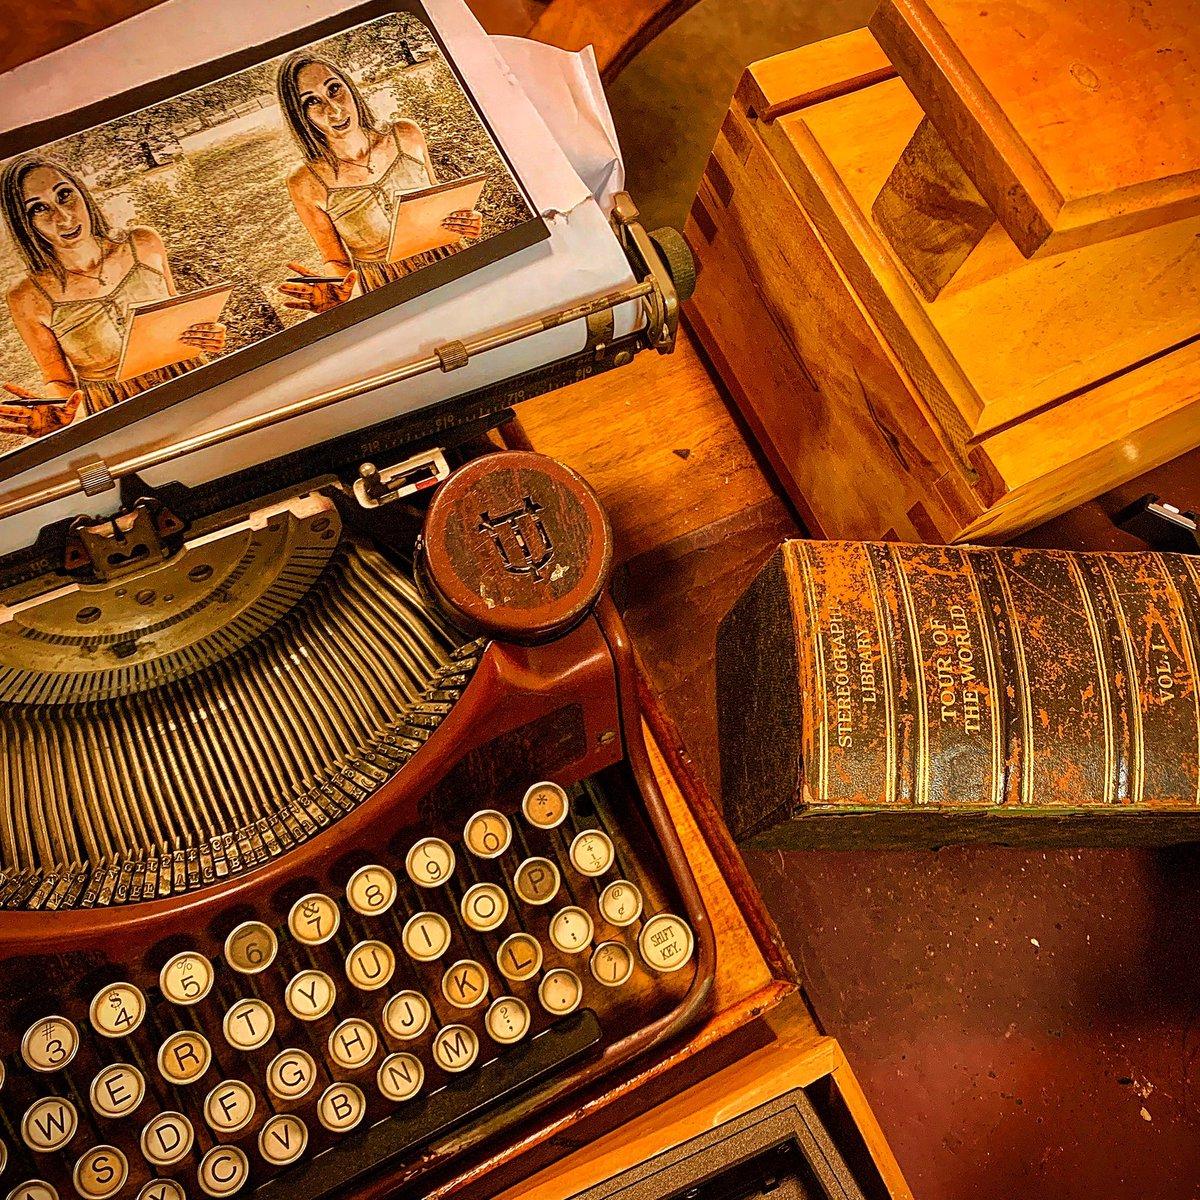 The Stereoscope. #horrorshorrorshorrors #darkdarkdark #darkwords #inproduction #actorlife #indiefilmmaking #indiefilm #setlife #scifinoir #fracturedmultiverse #art #photography #boson #fermion #anyon #angularmomentum https://www.imdb.com/title/tt12389846/… #amygdala #topquark #charmquark #actorpic.twitter.com/U56ThxWIuI